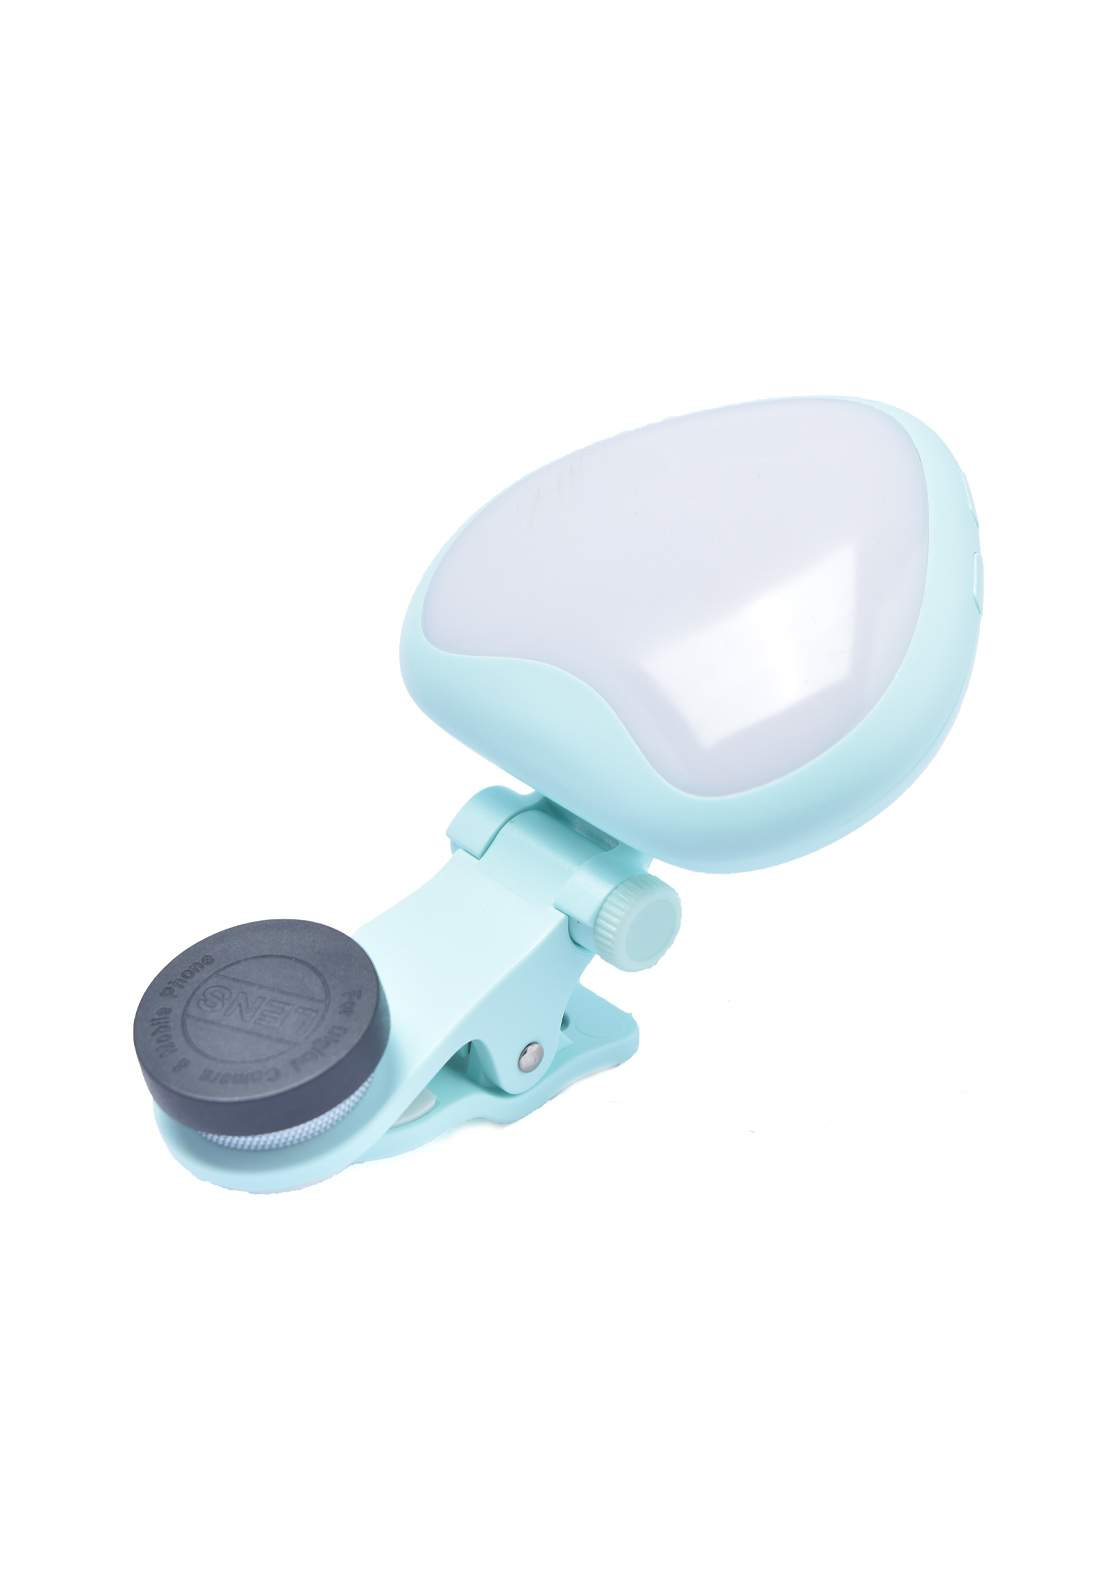 Minigood  Beauty LED Flash Lights and Lens عدسة مع فلاش للموبايل